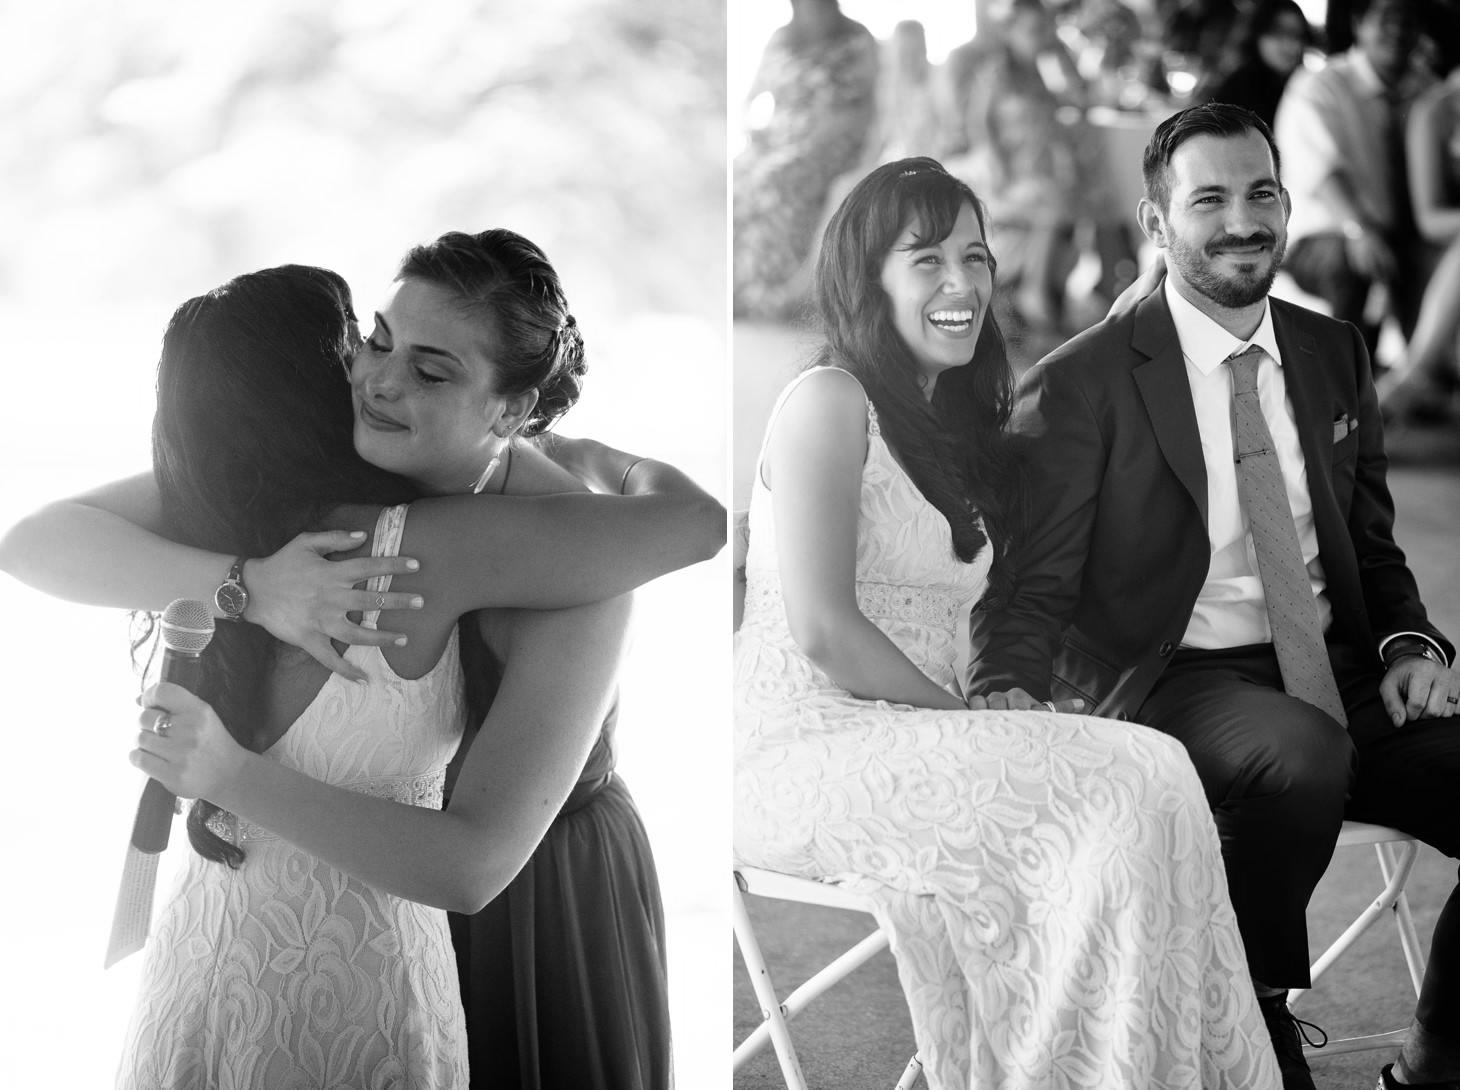 009-nyc-wedding-photographer-smitten-chickens-eco-friendly-outdoor-wedding-.jpg